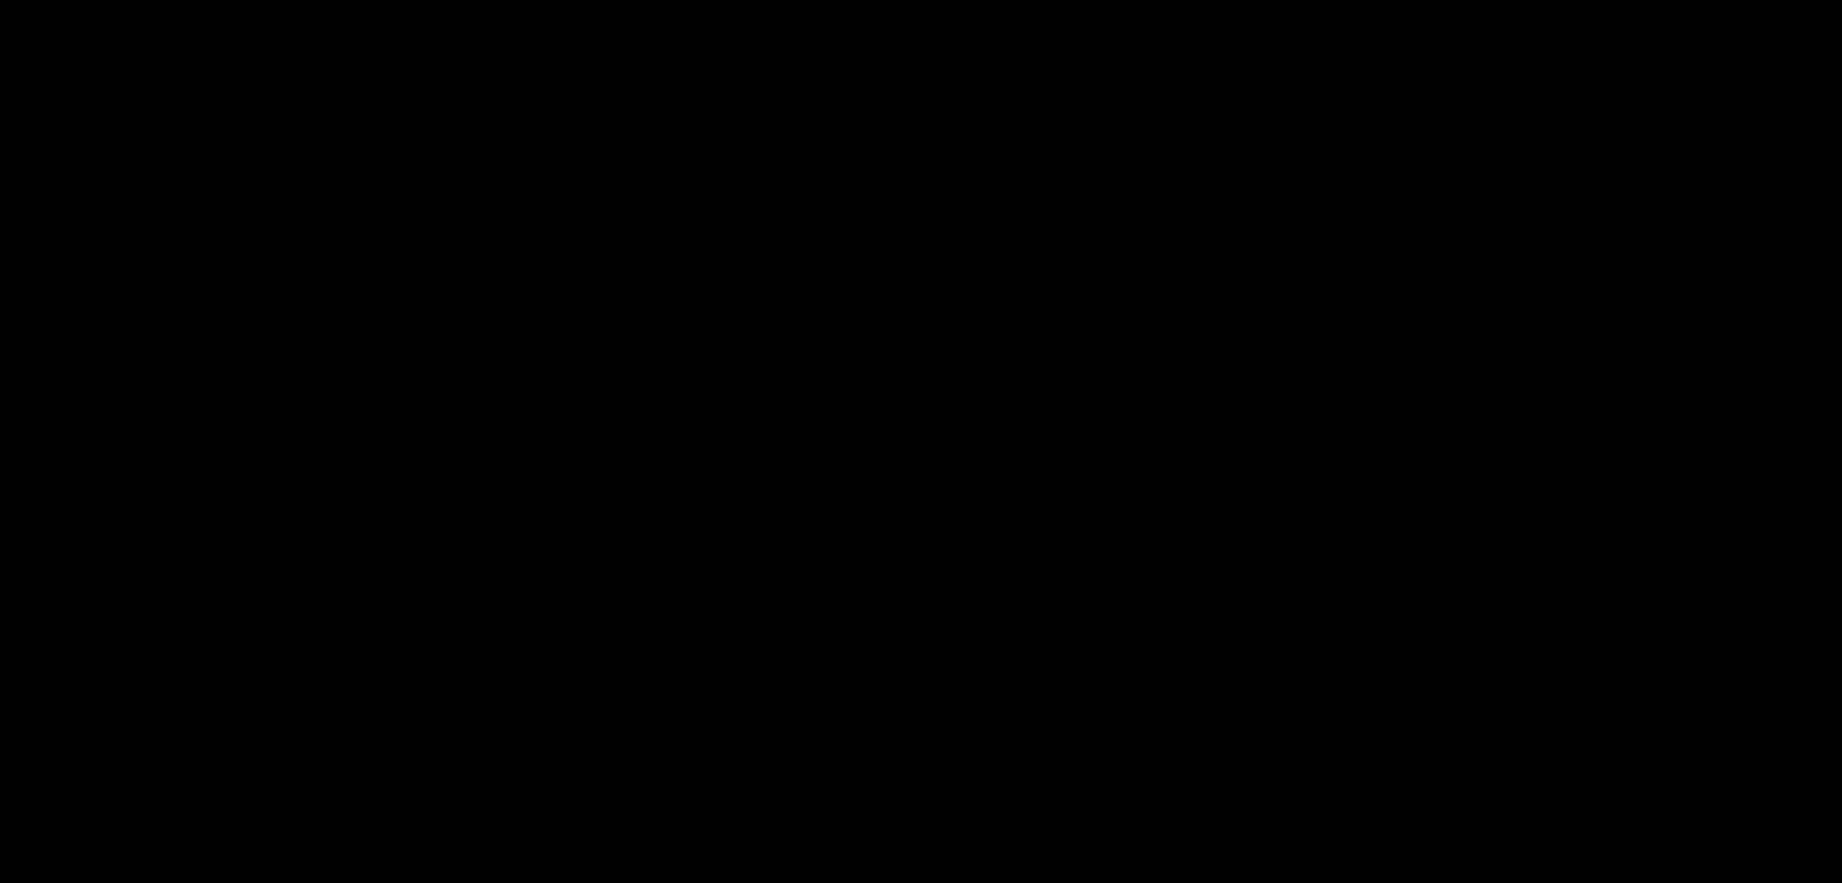 cl-5-14-18